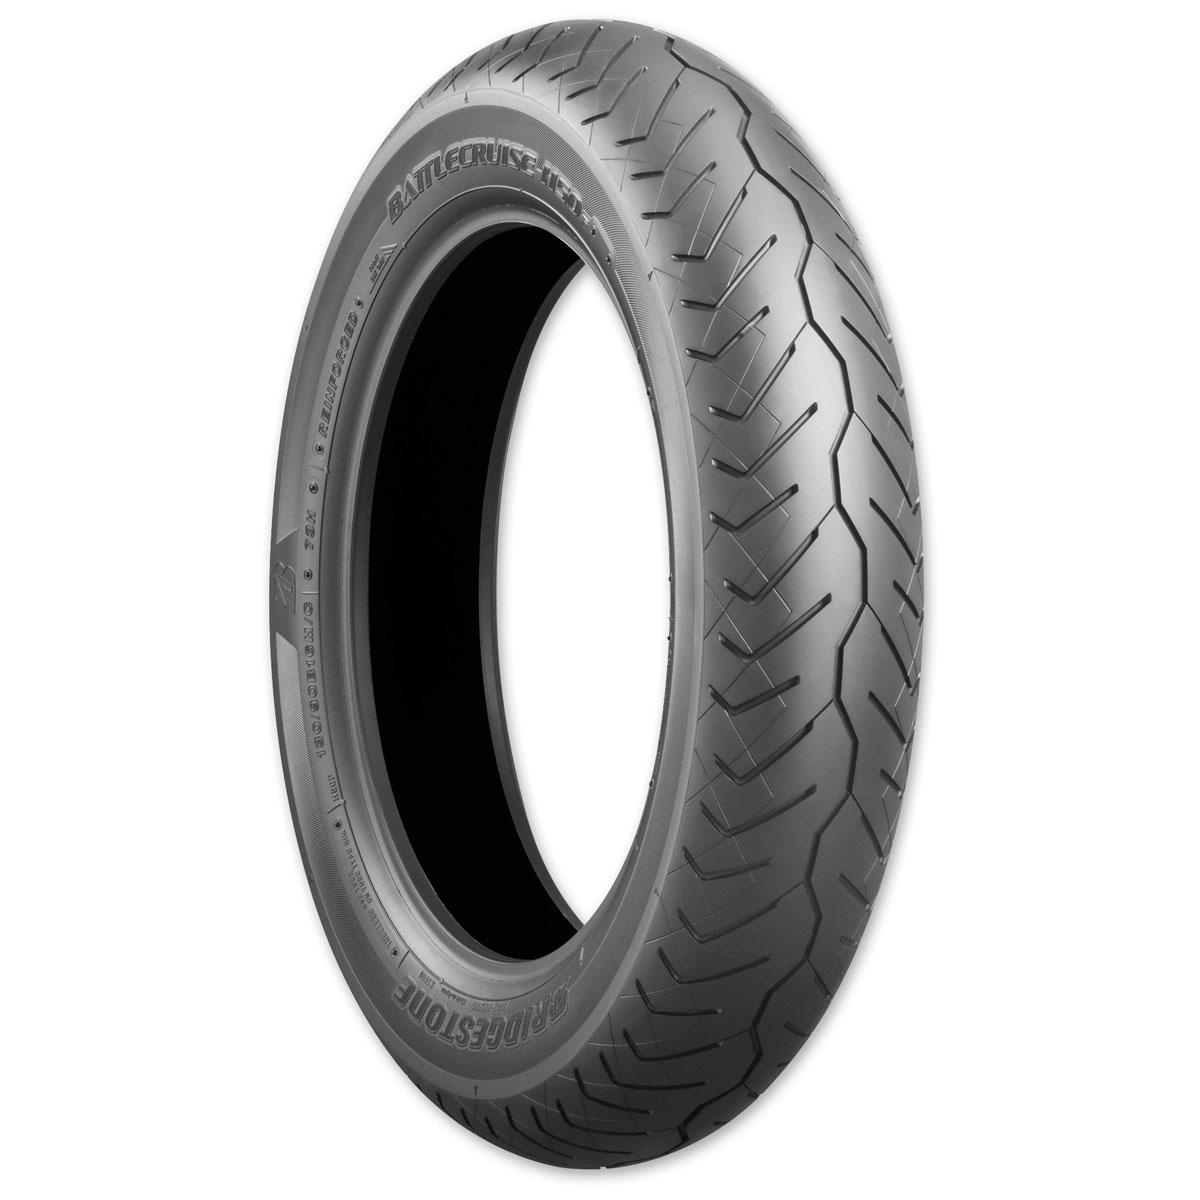 Bridgestone Battlecruise H50 180/55B18 Rear Tire